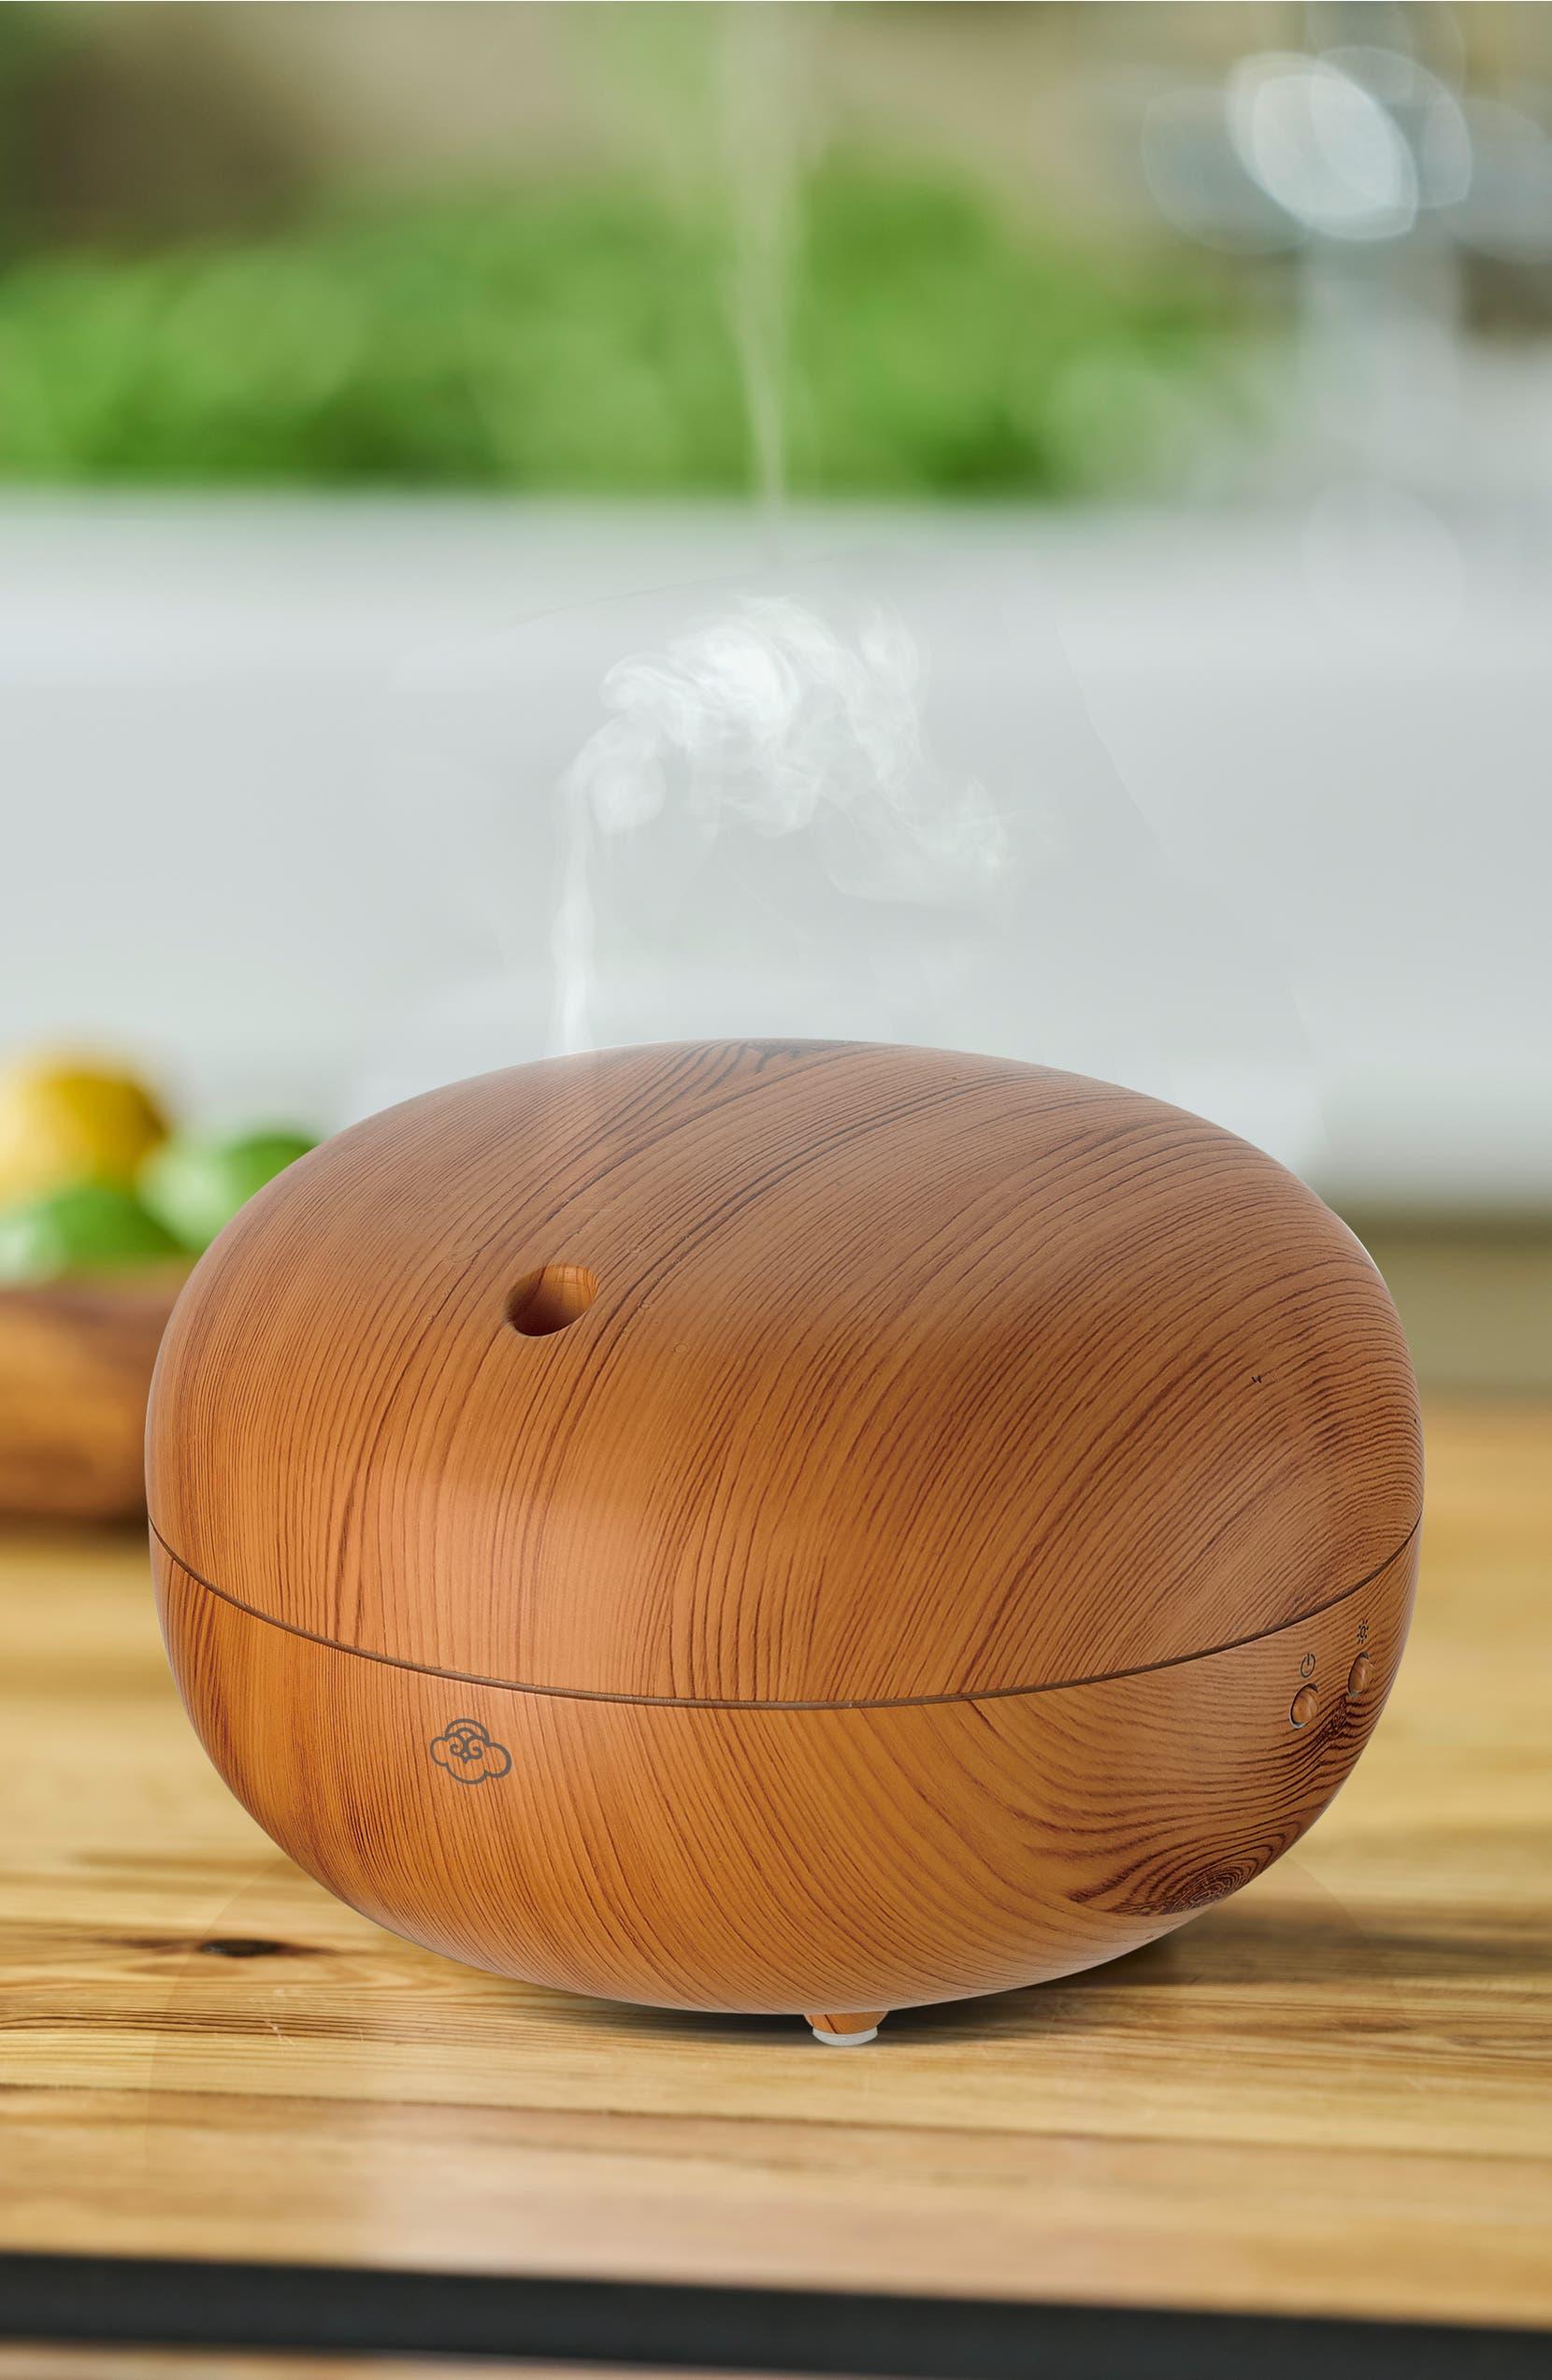 SERENE HOUSE Ultrasonic Cool Mist Macaron Aromatherapy Diffuser, Alternate, color, LIGHT WOOD